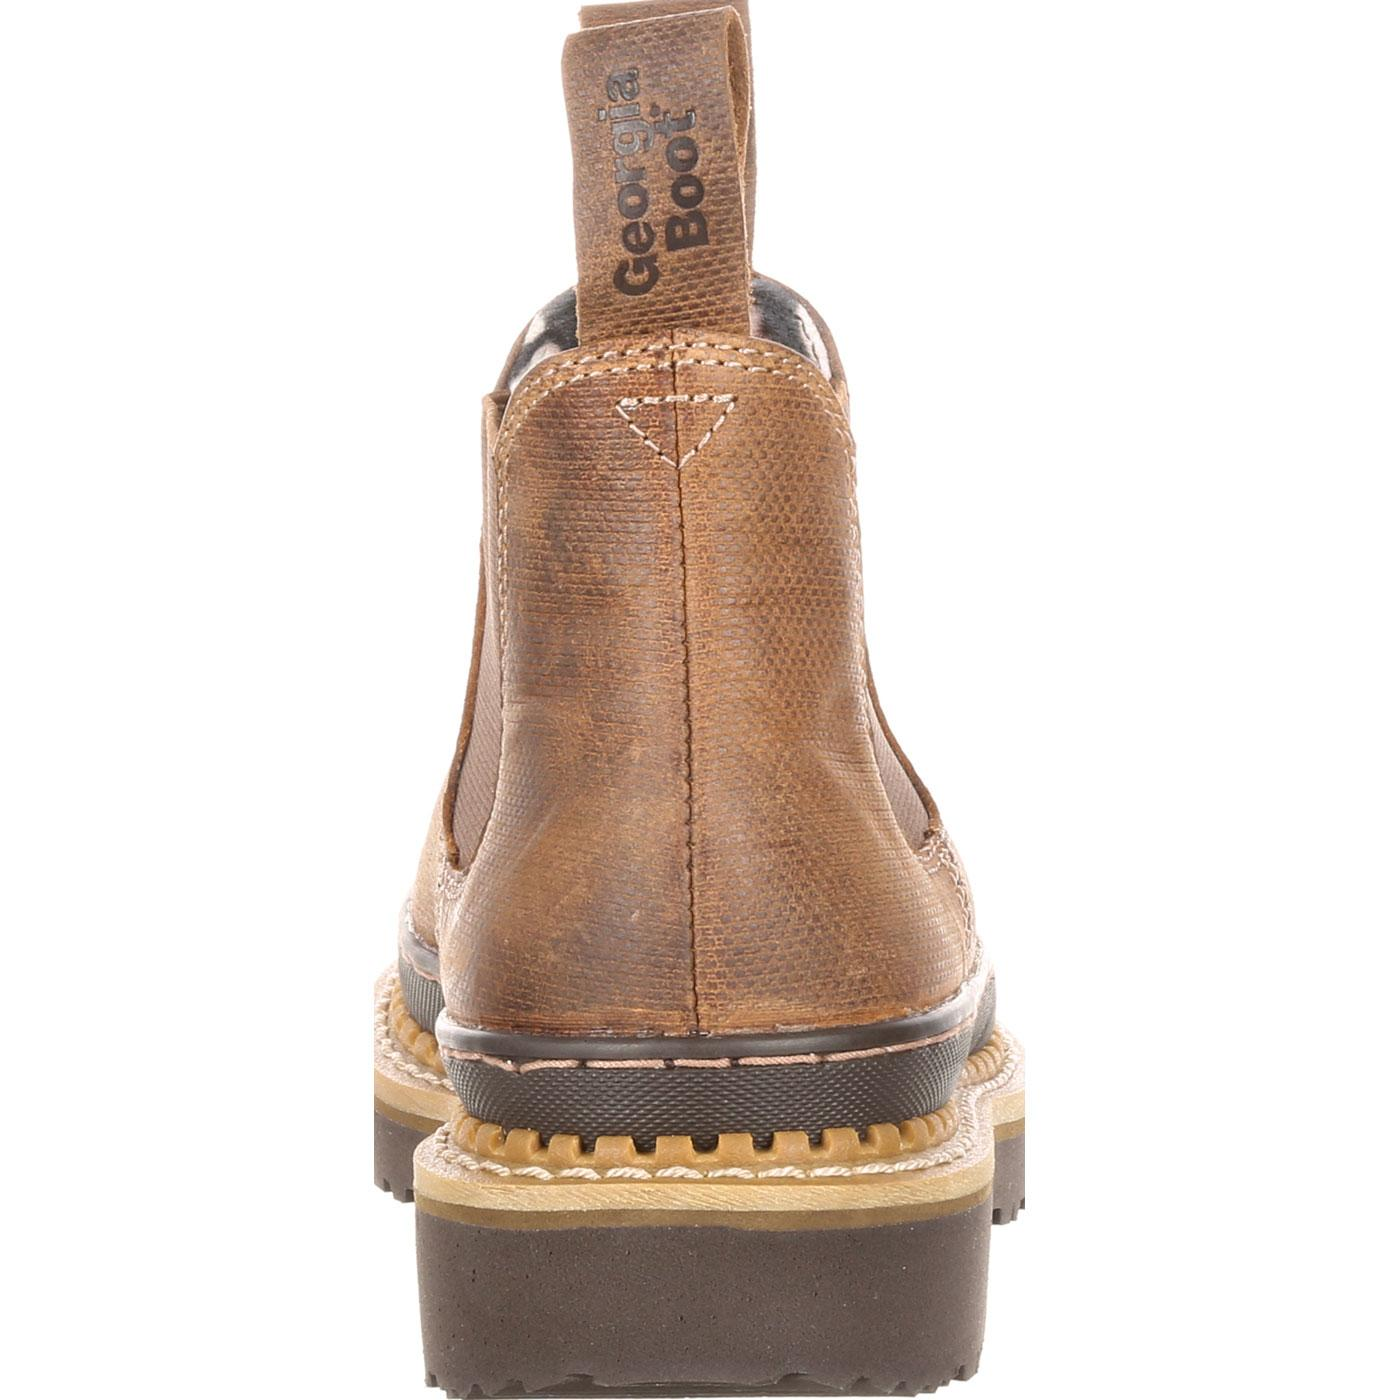 0af596af342 Georgia Giant Women s Embossed High Romeo. Brown leather slip-on shoe ...